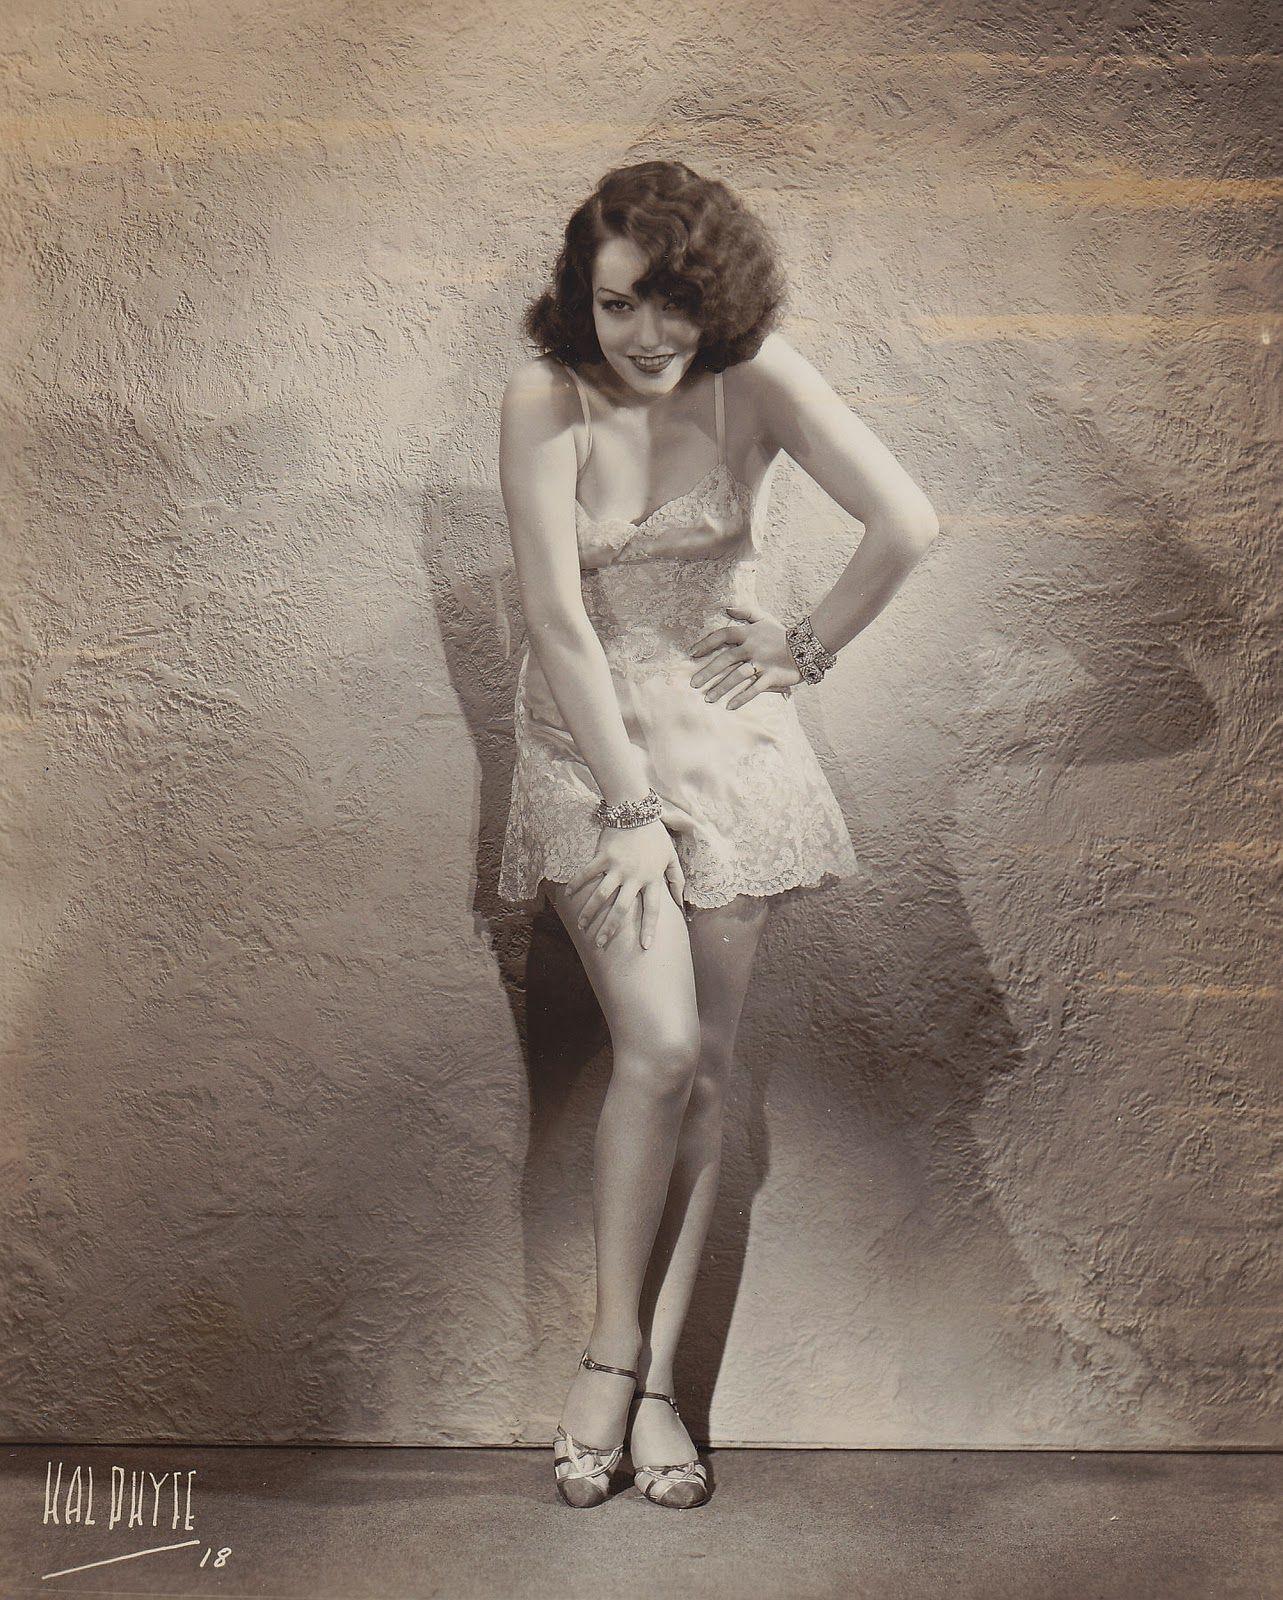 Vivian Velez Porn Cheap lupe velez - c.1933 vintage everyday: beautiful and sexy portrait